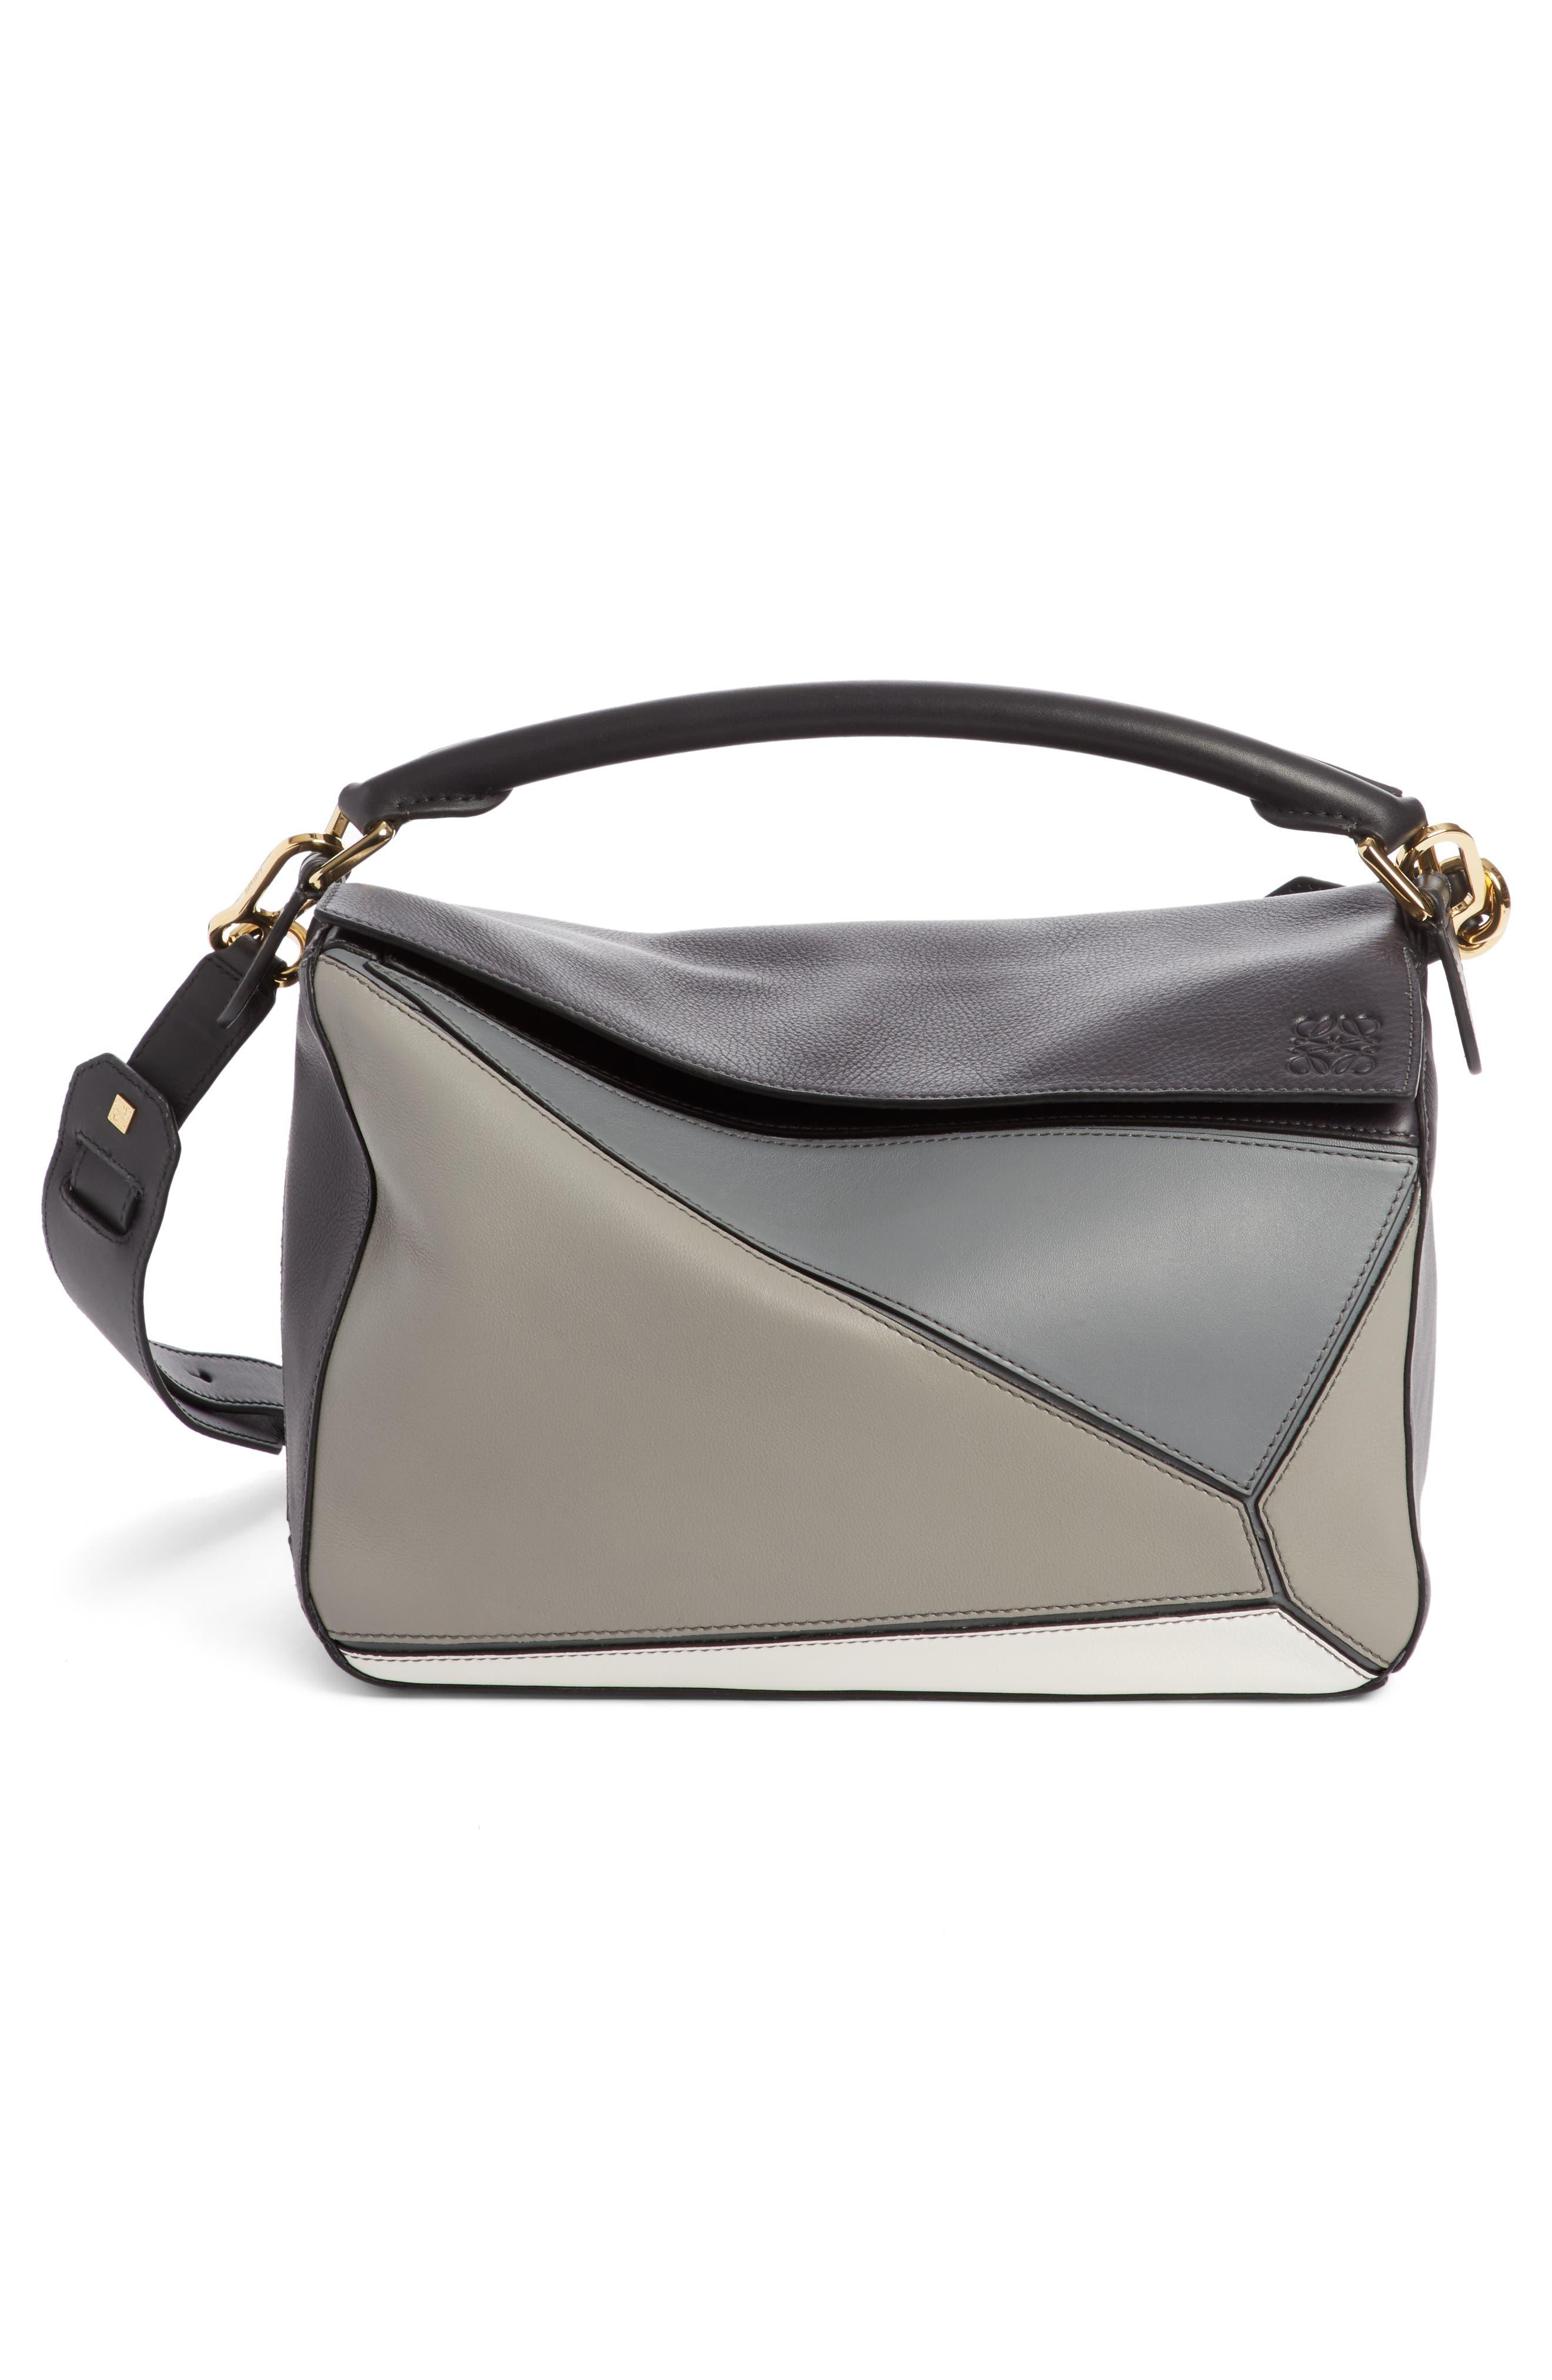 Main Image - Loewe Medium Puzzle Colorblock Leather Shoulder Bag